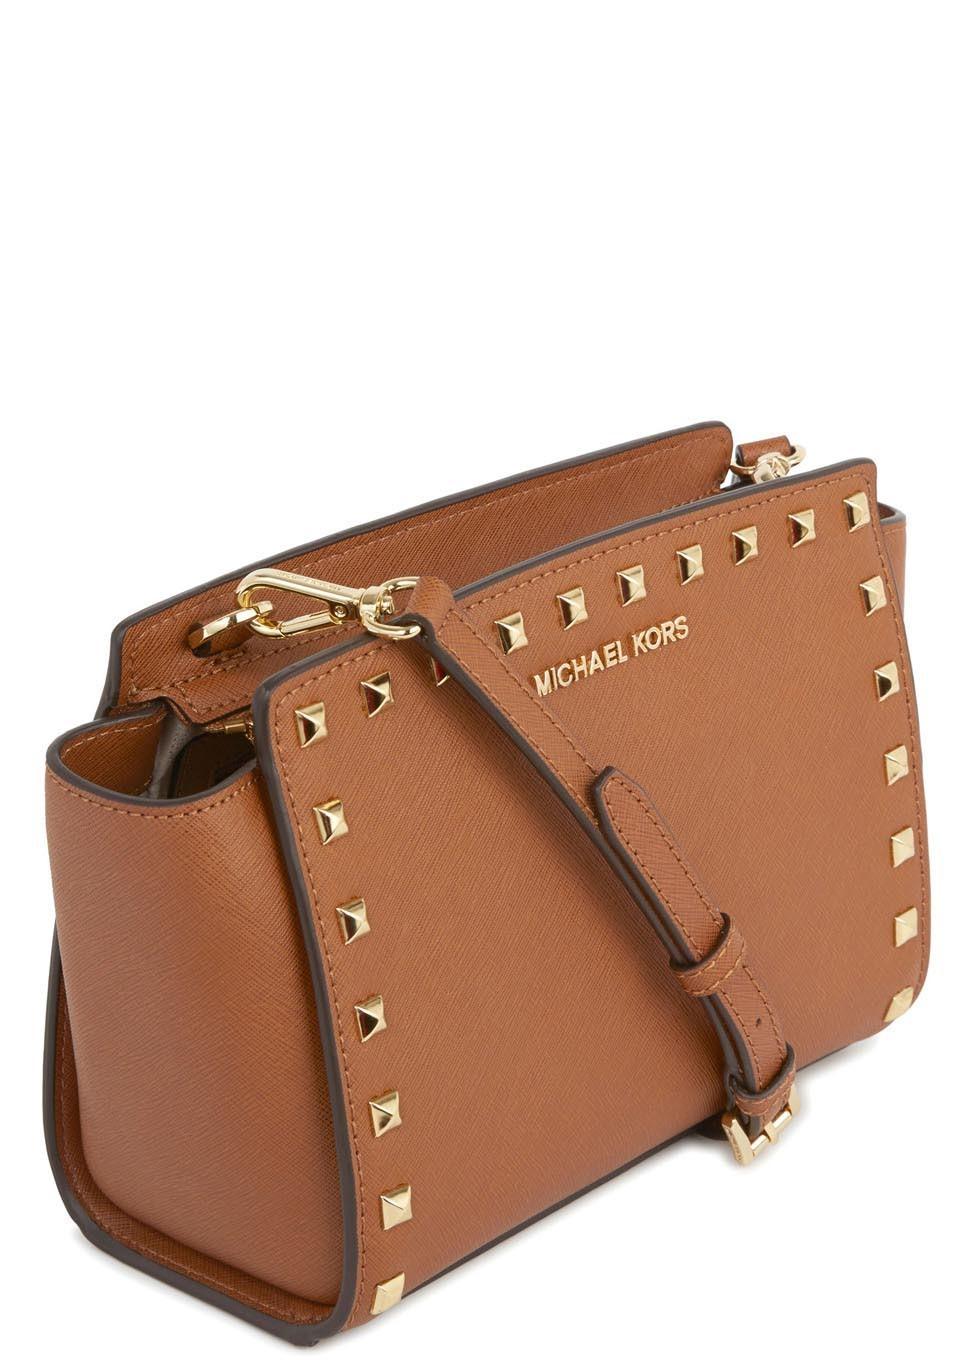 Selma Studded Tan Leather Crossbody Bag